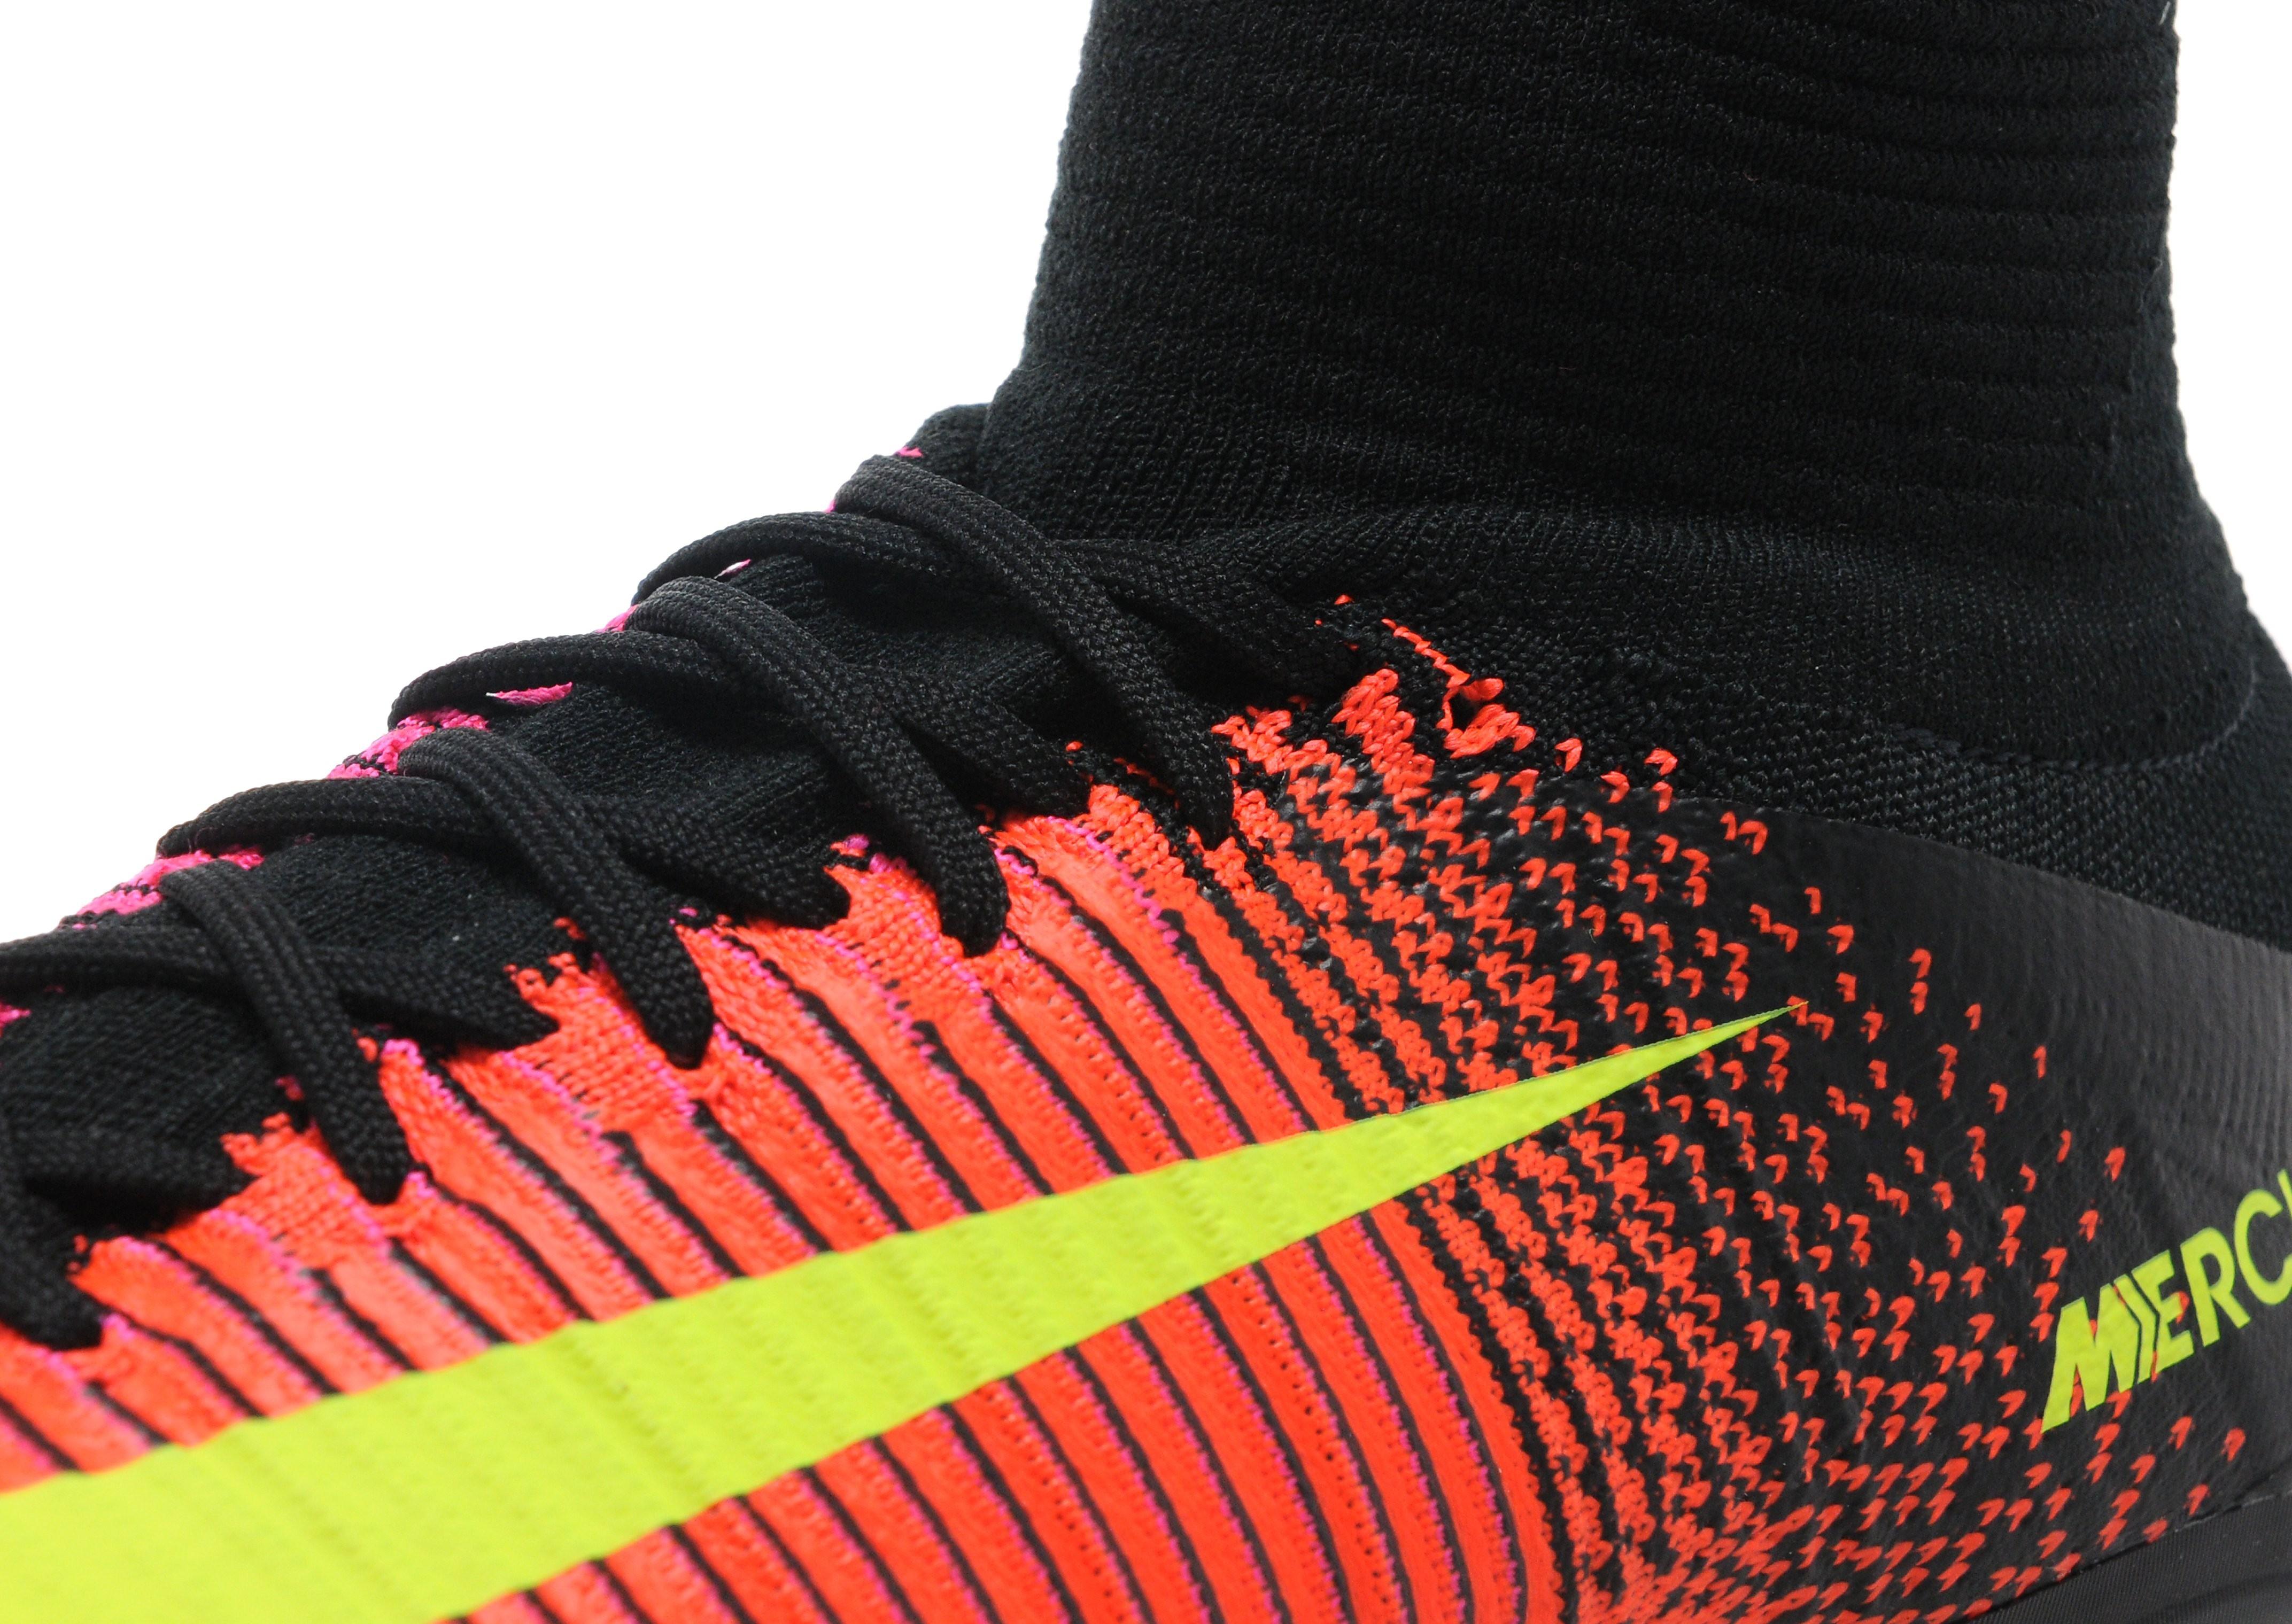 Nike Spark Brilliance Mercurial Superfly V FG